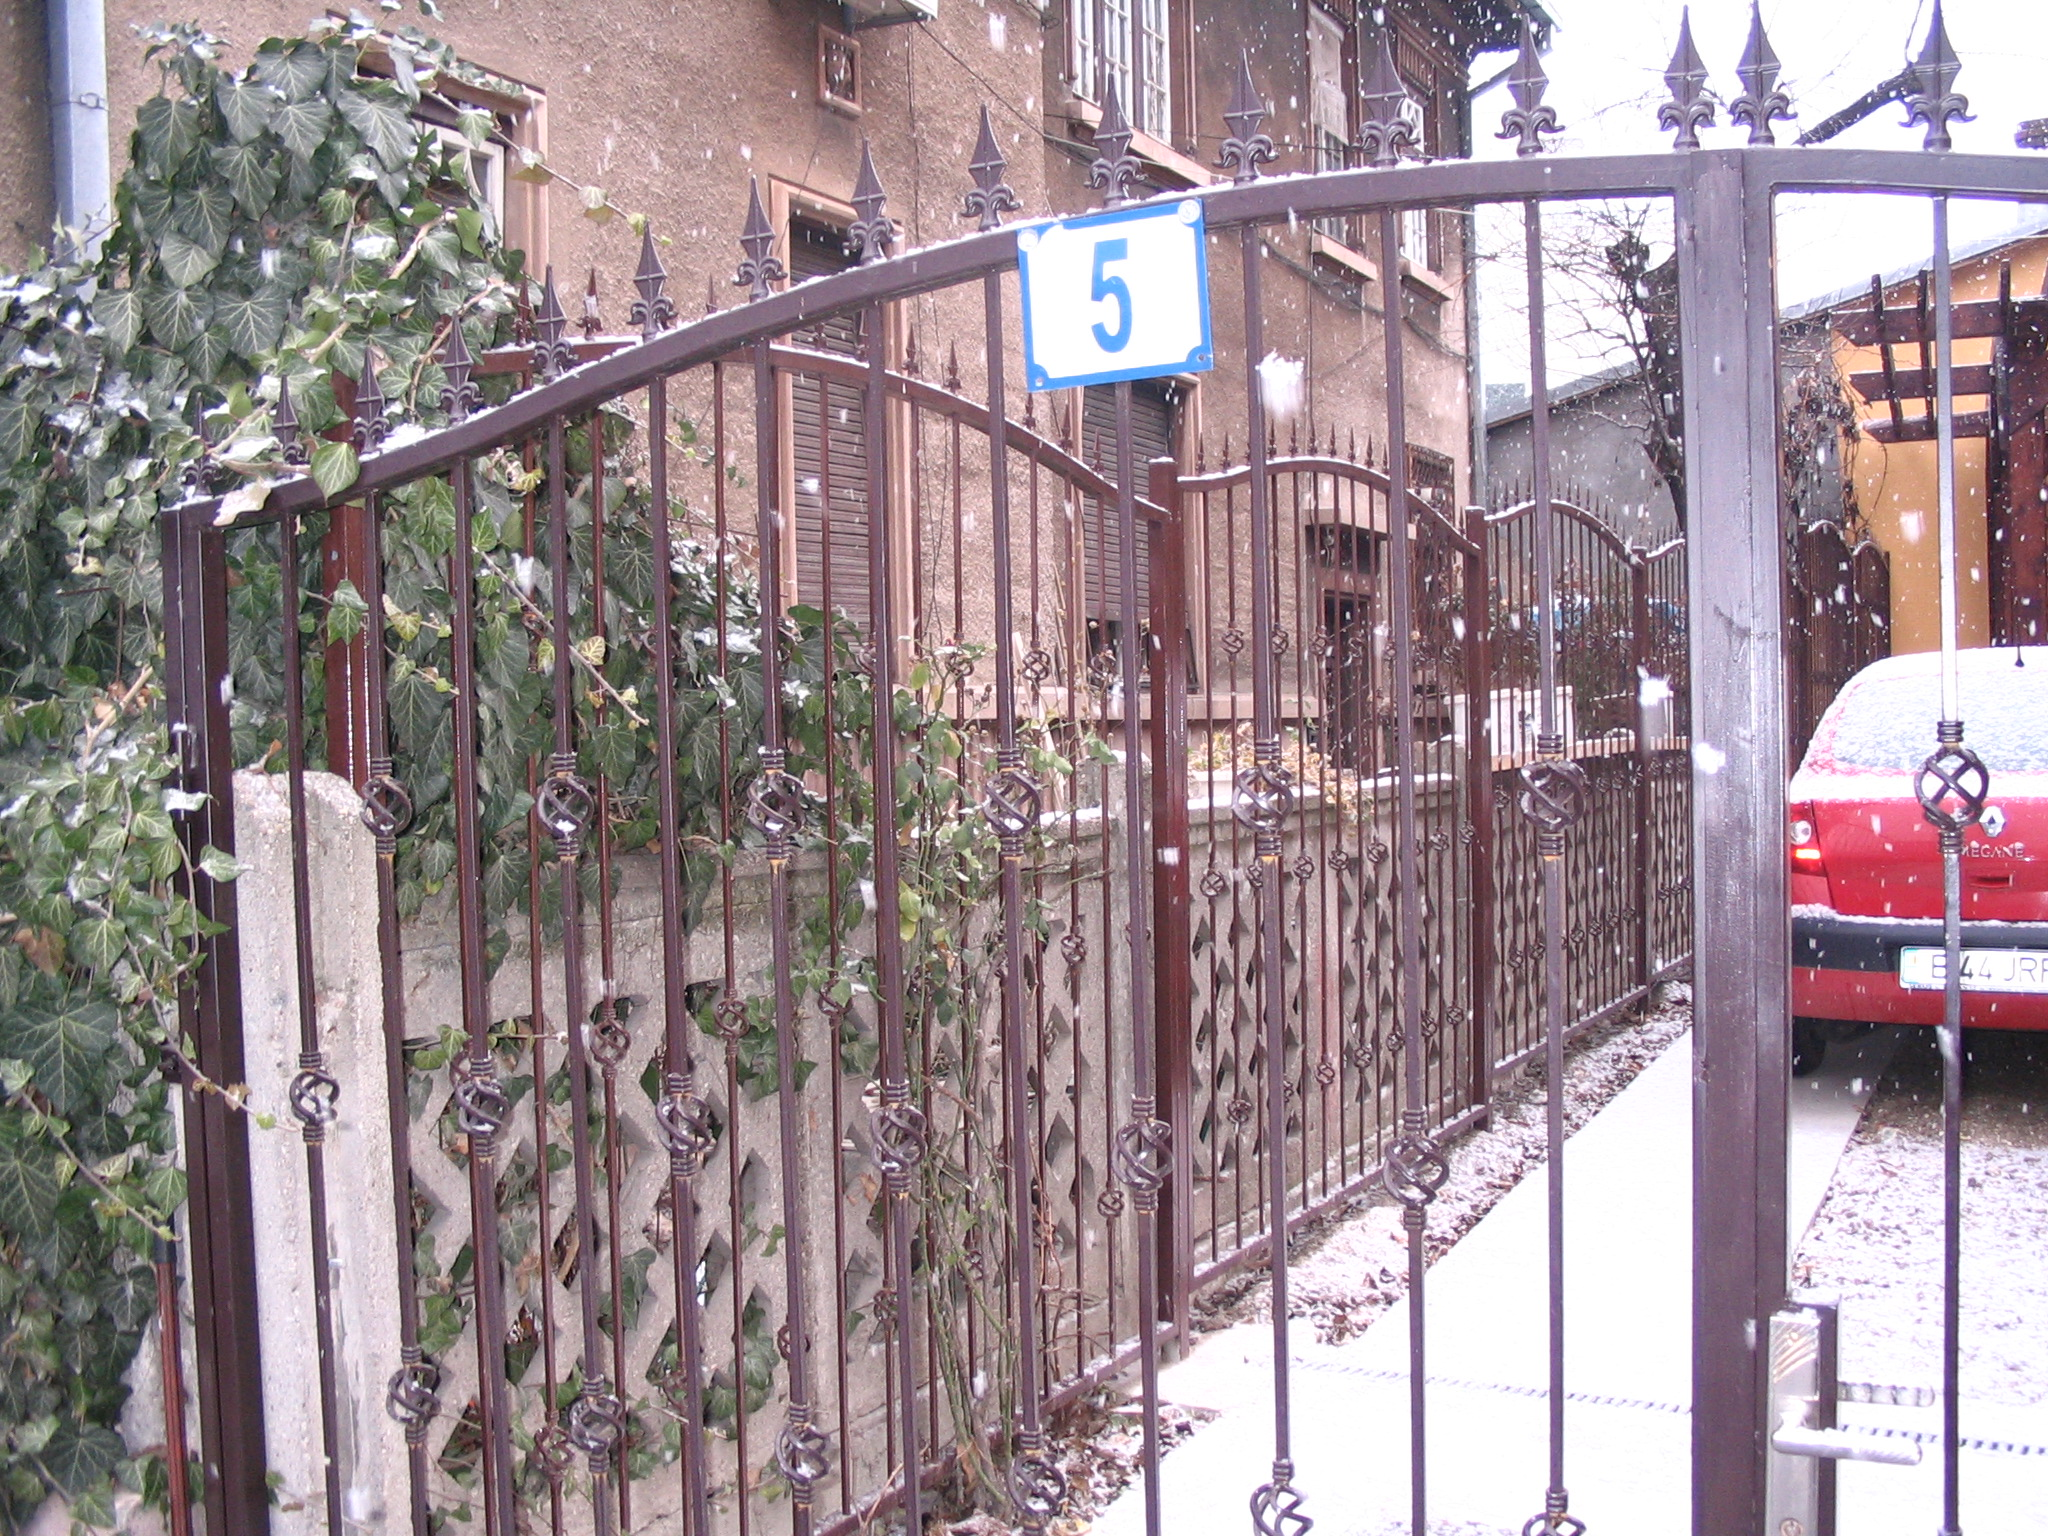 Reamenajare locuinta unifamiliala in str. Intrarea Noptii nr. 5  - Poza 1